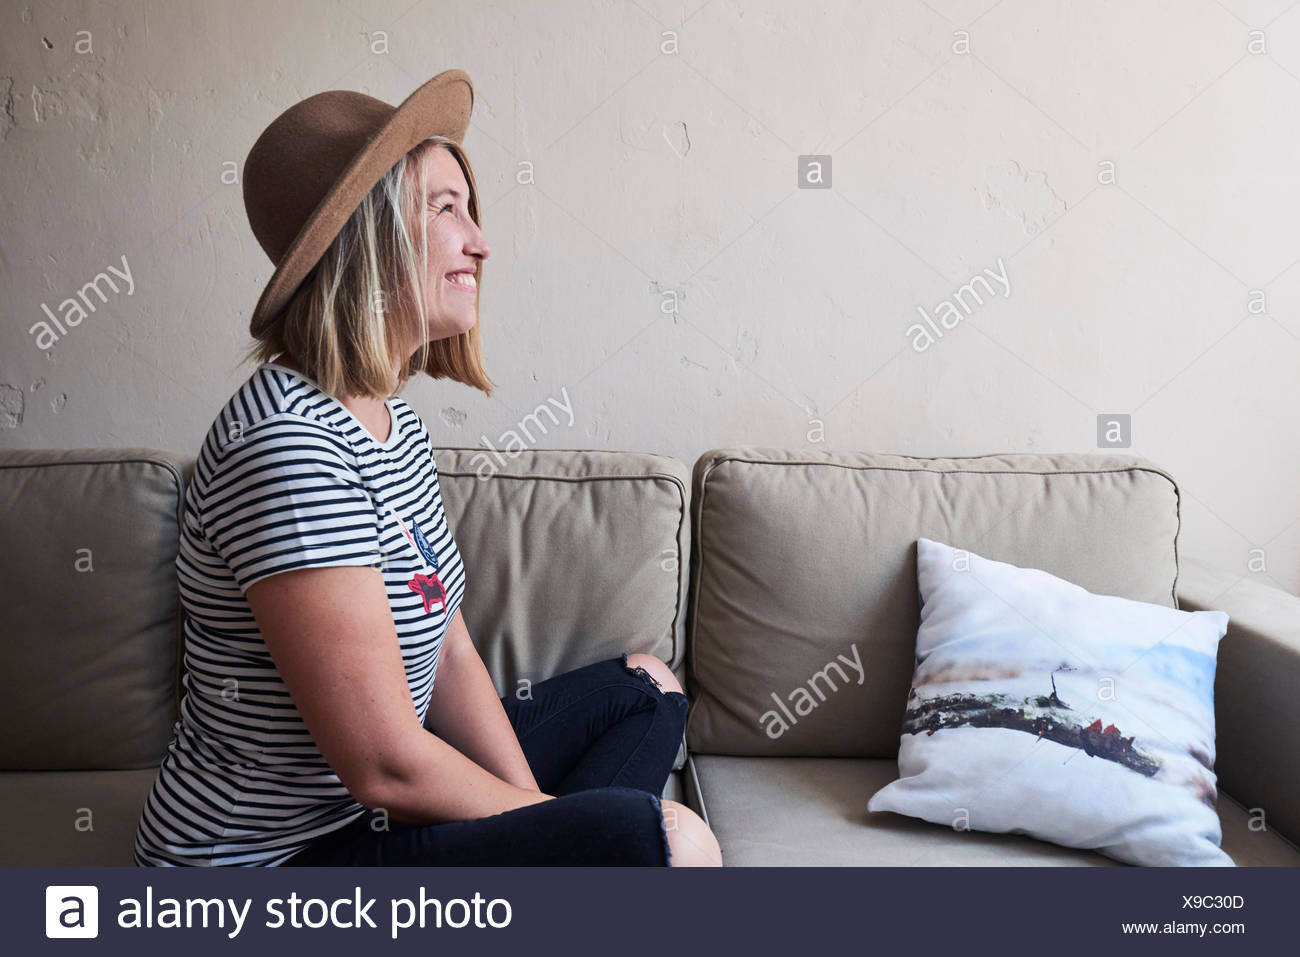 Mujer sentada en un sofá, sonriendo, vista lateral Imagen De Stock